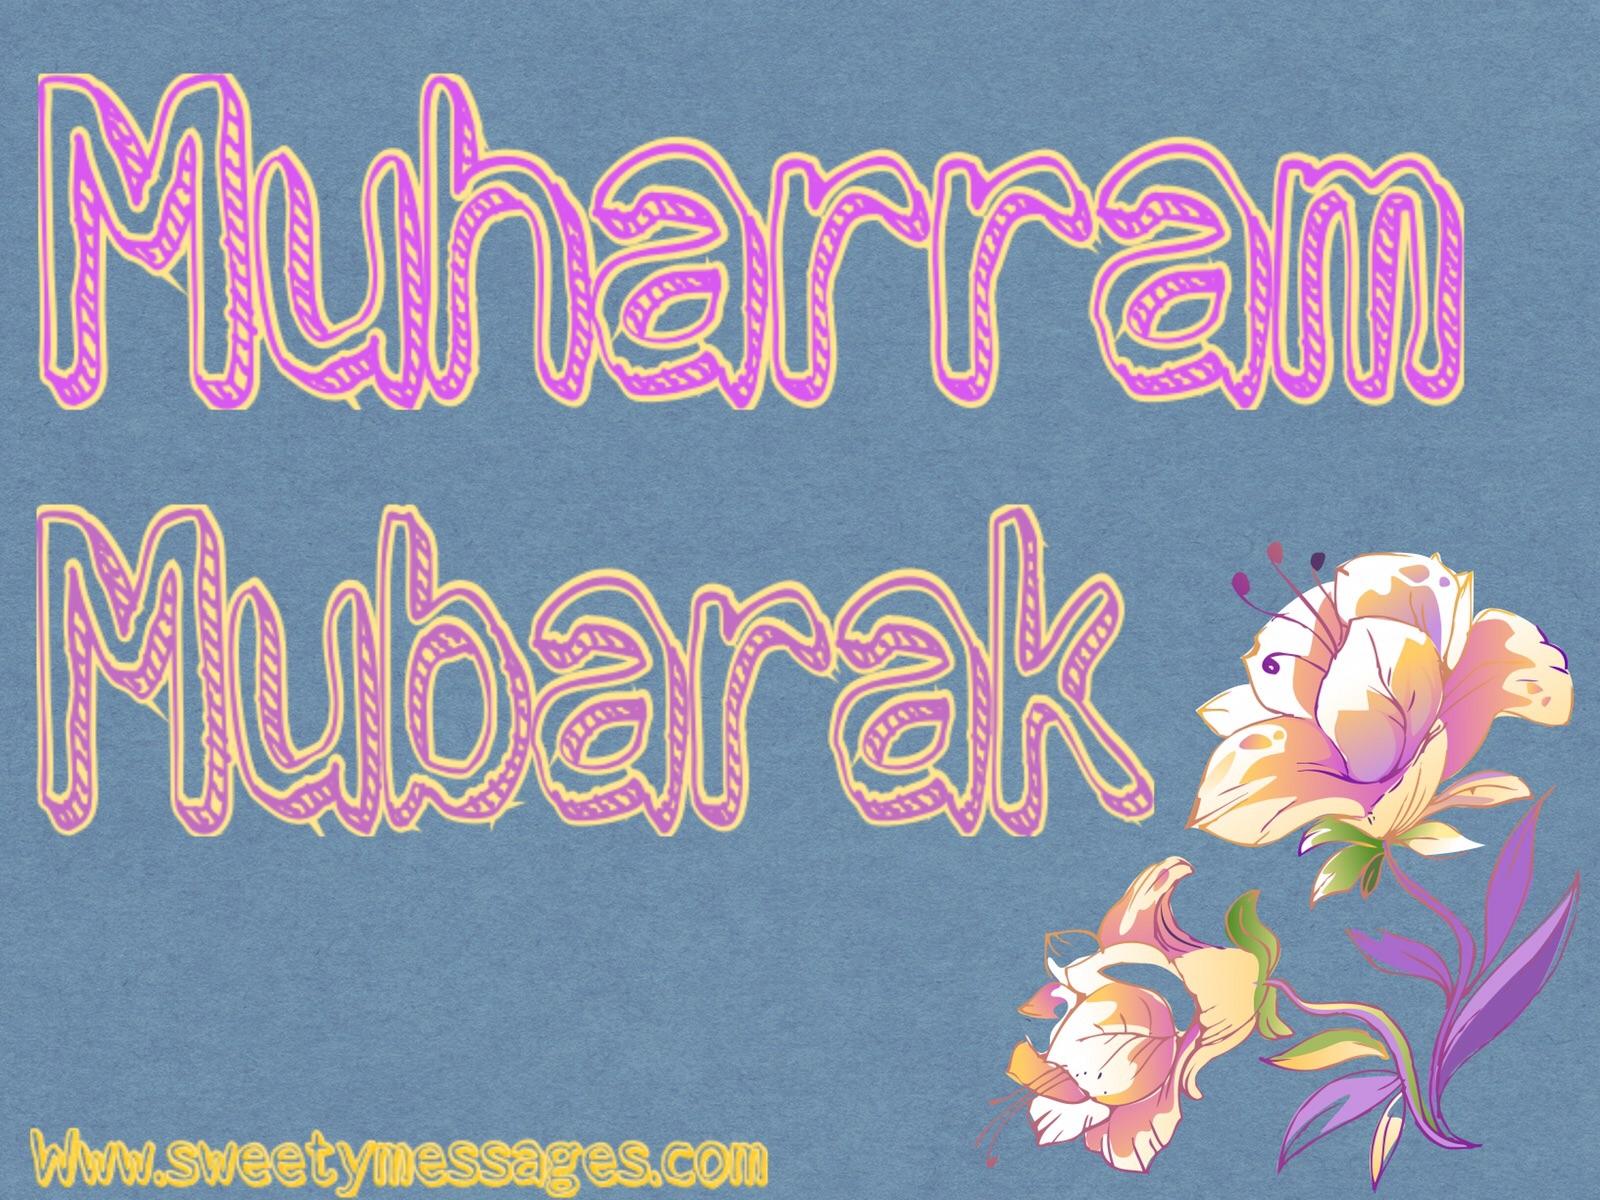 Muharram Mubarak Messages And Images Beautiful Messages